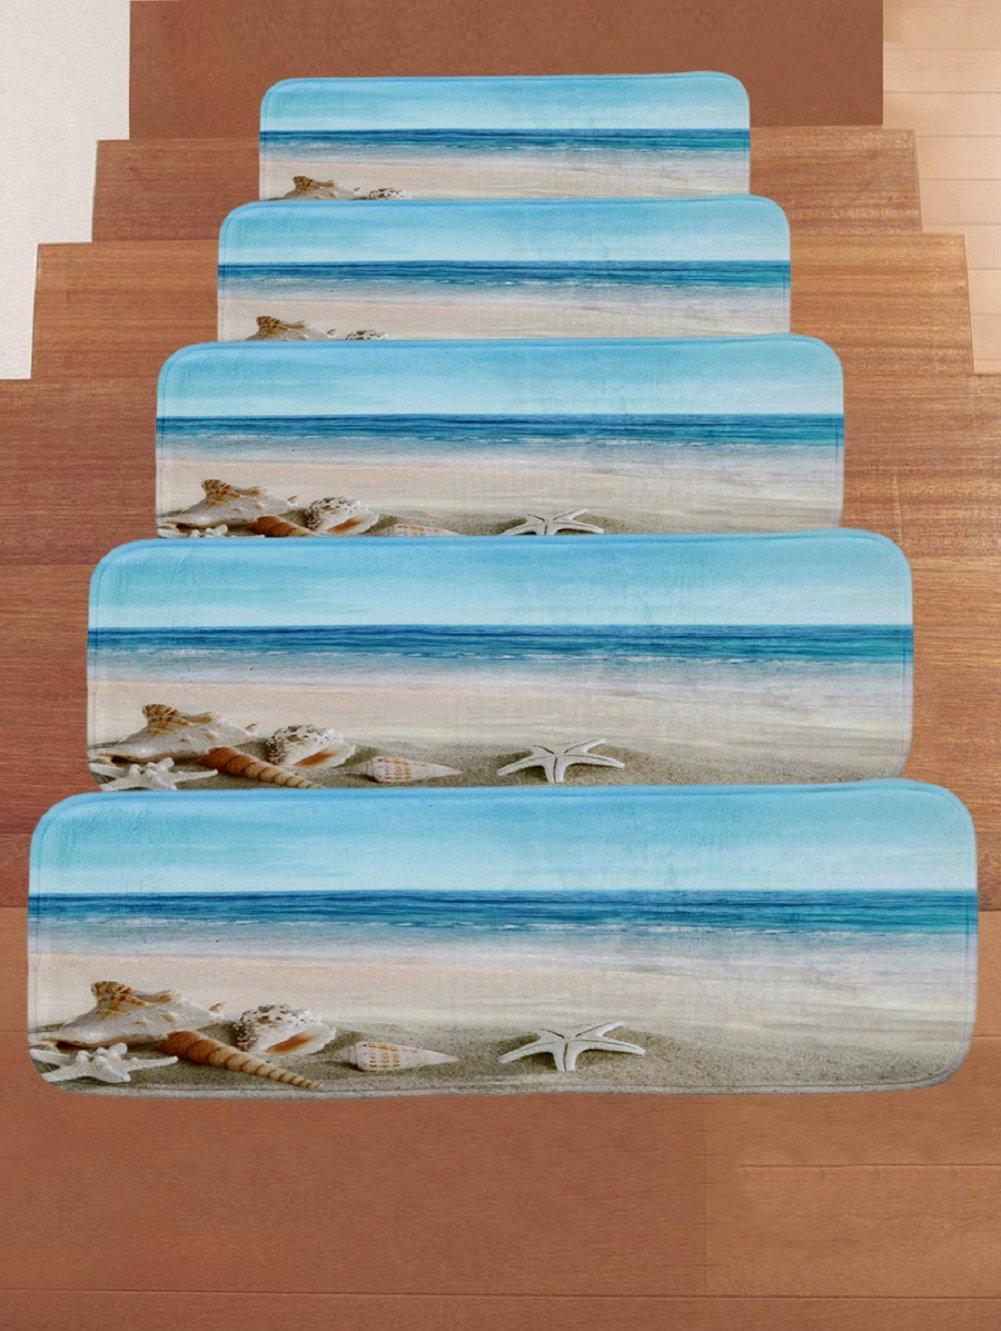 GUSJ 7pz stair Pads coral velvet tappeto stair step tappeto, tappeto da cucina, pavimento tappeto, zerbino | anti-skid, confortevole e morbido tappeto per scale | 70x 22cm yqigo.cn